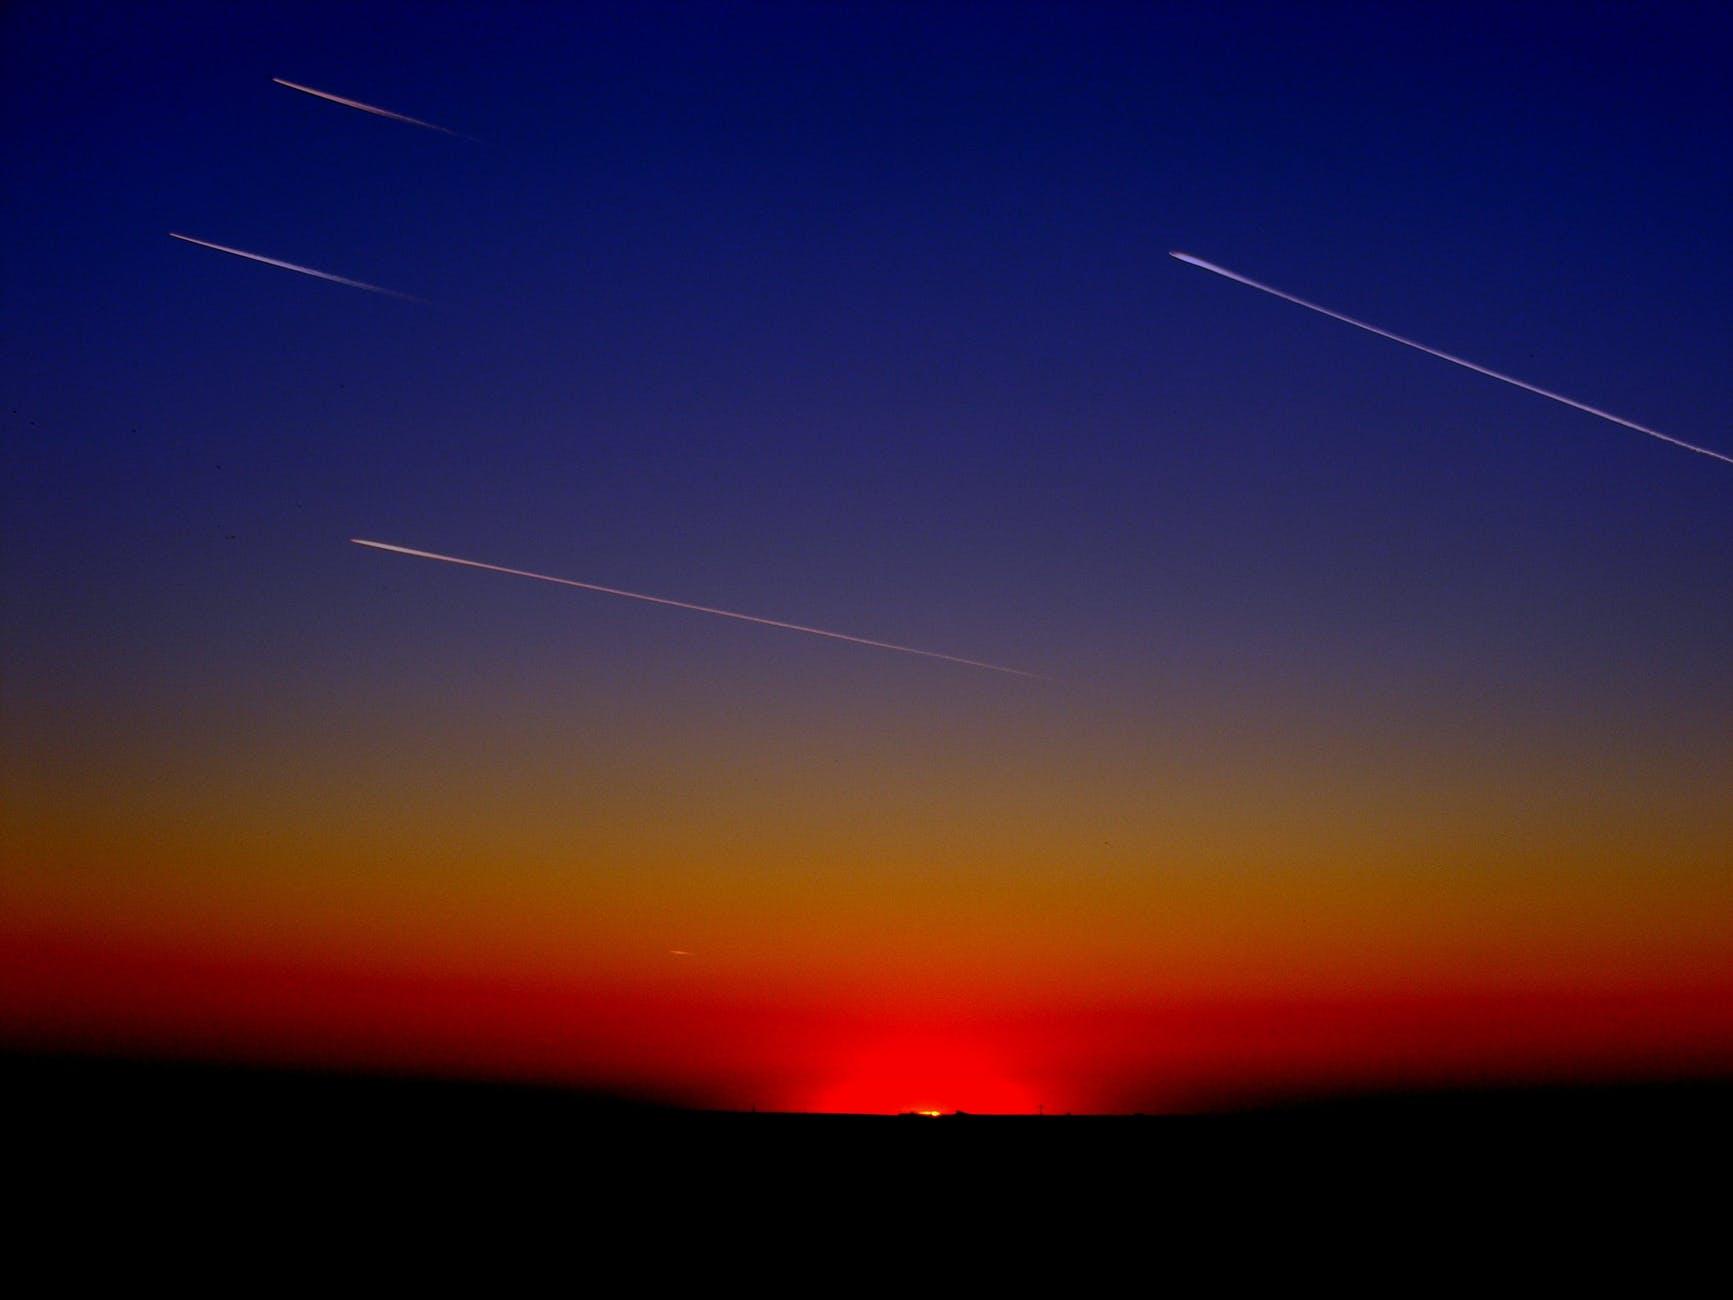 falling stars at night